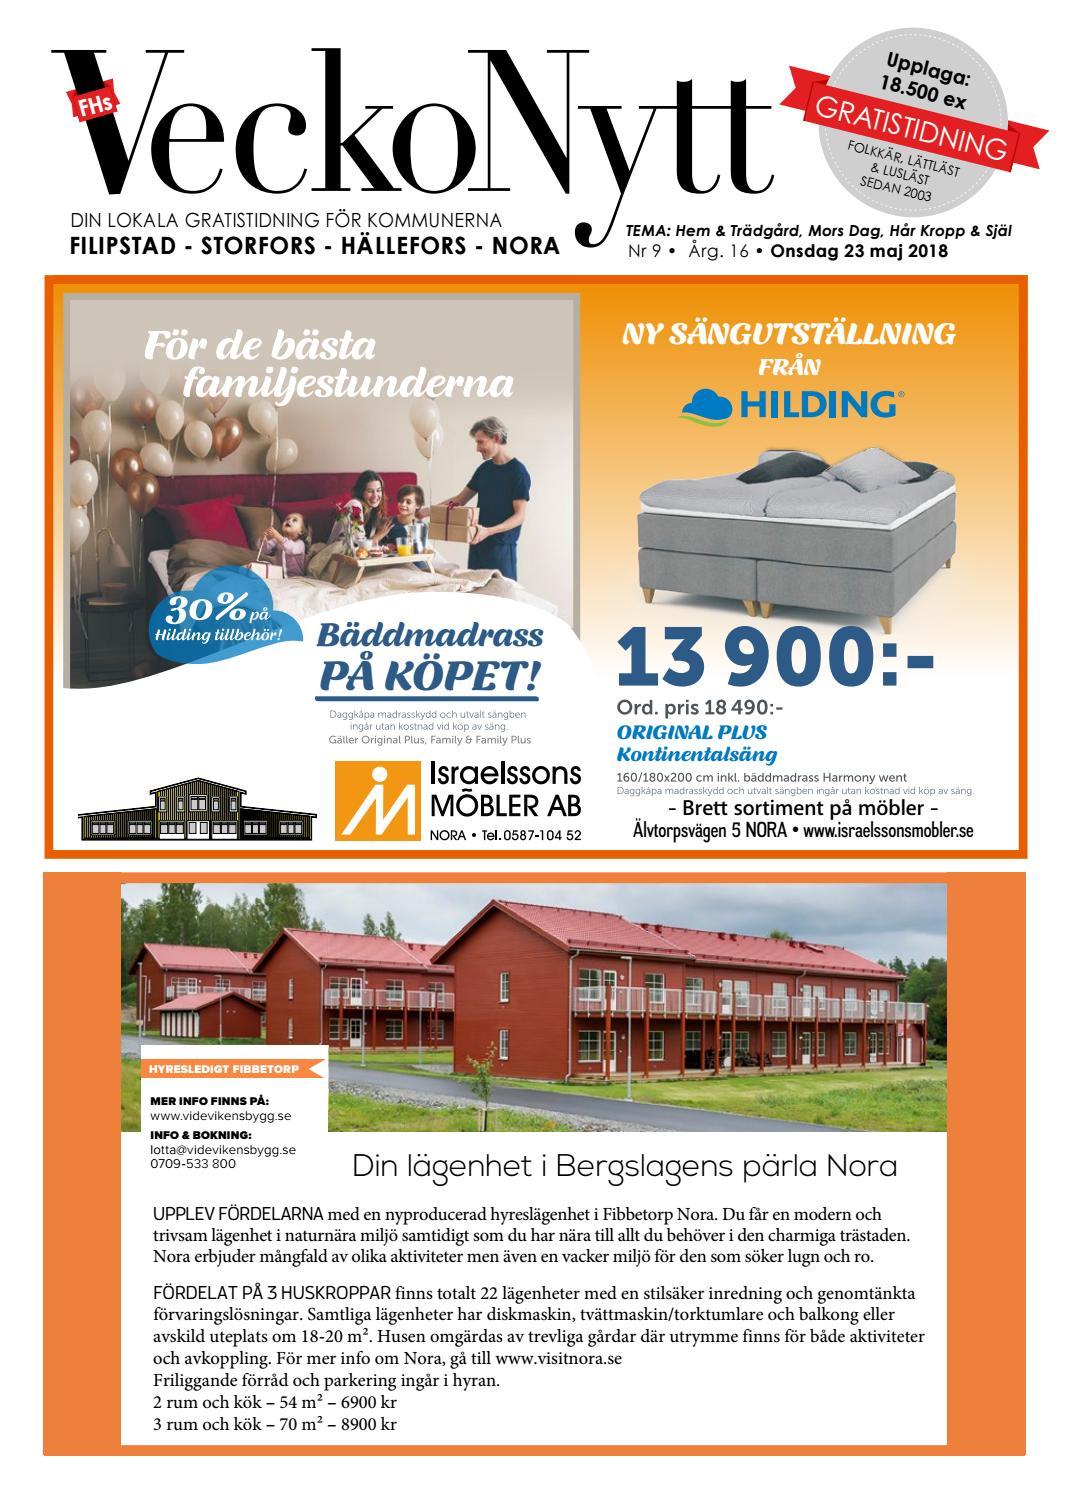 Tage Vidar Persson, Hjulsj 8, Hllefors | patient-survey.net